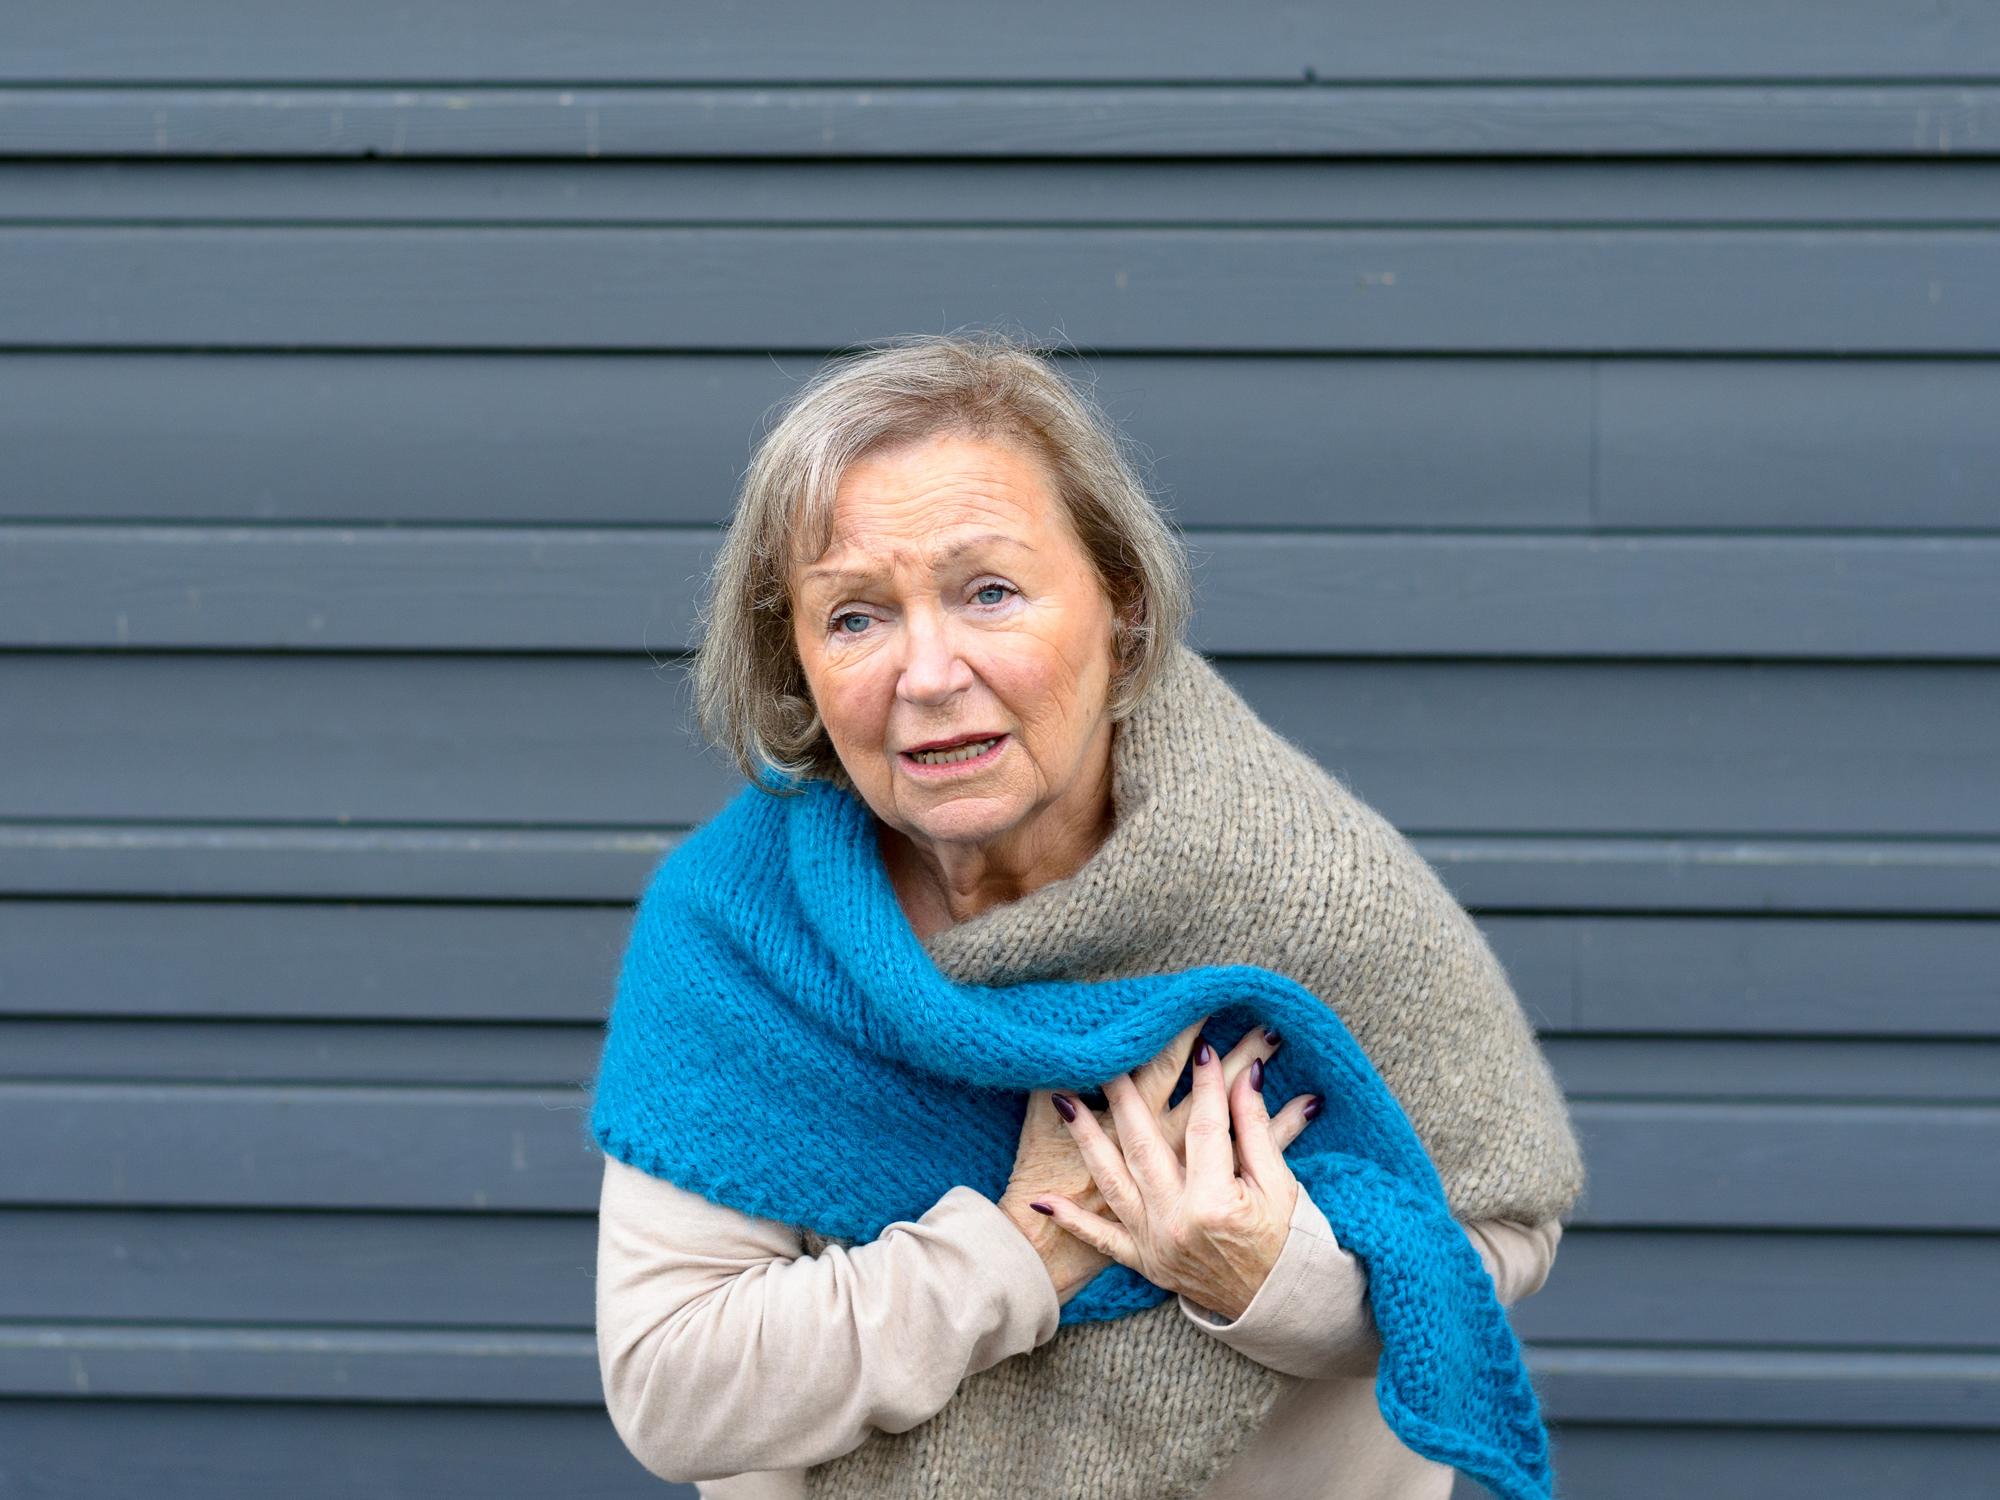 Seniro Woman having heart attack